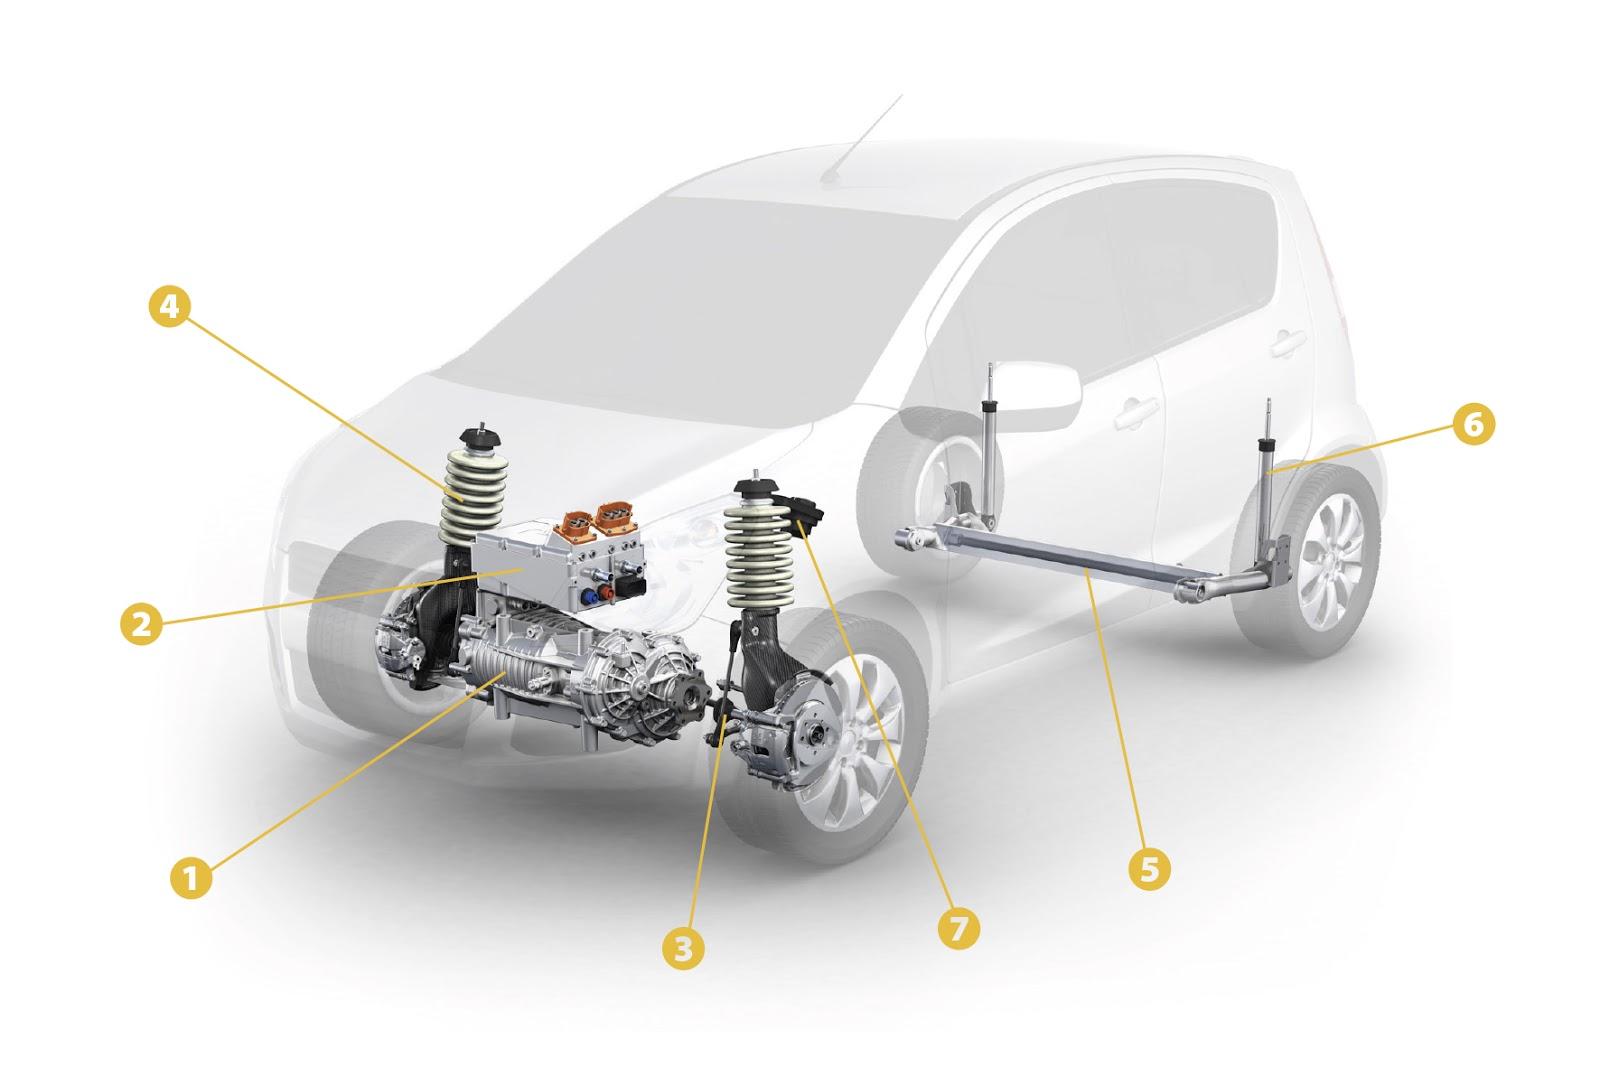 Red Bull Kühlschrank Tanksäule : Leichtbau mobile aspekte